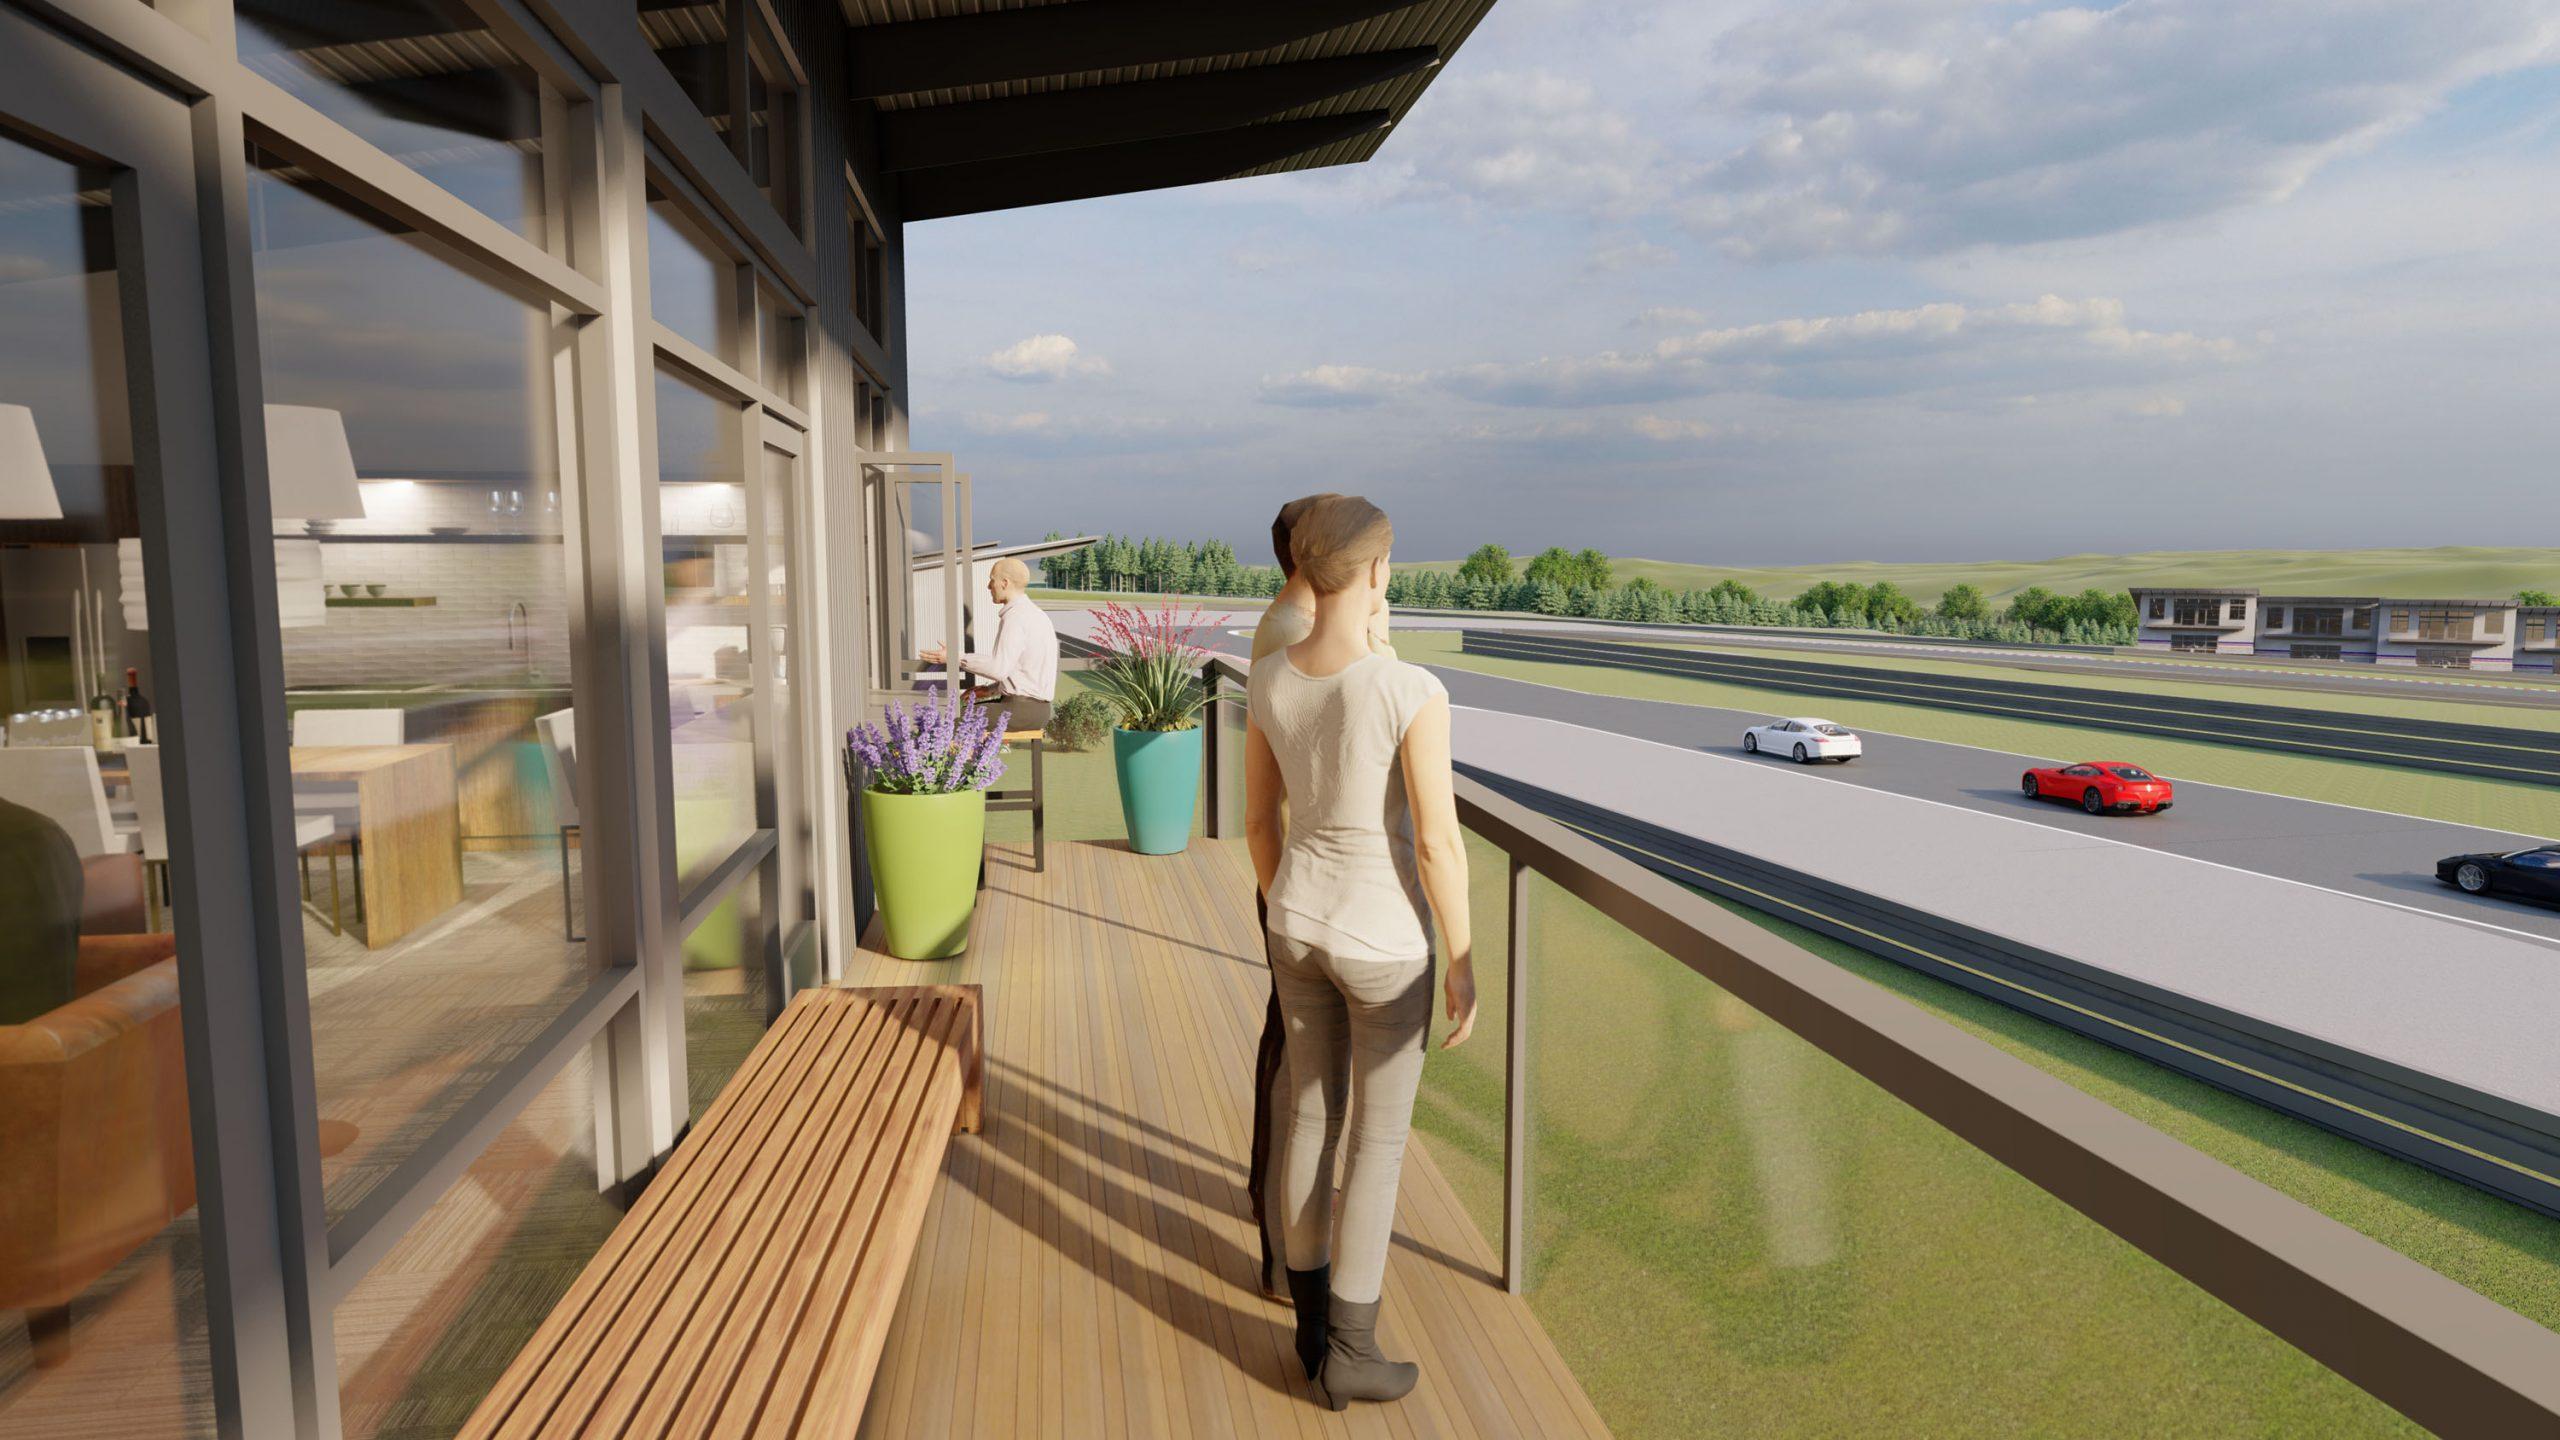 Autominiums condo rendering porch overlooking track